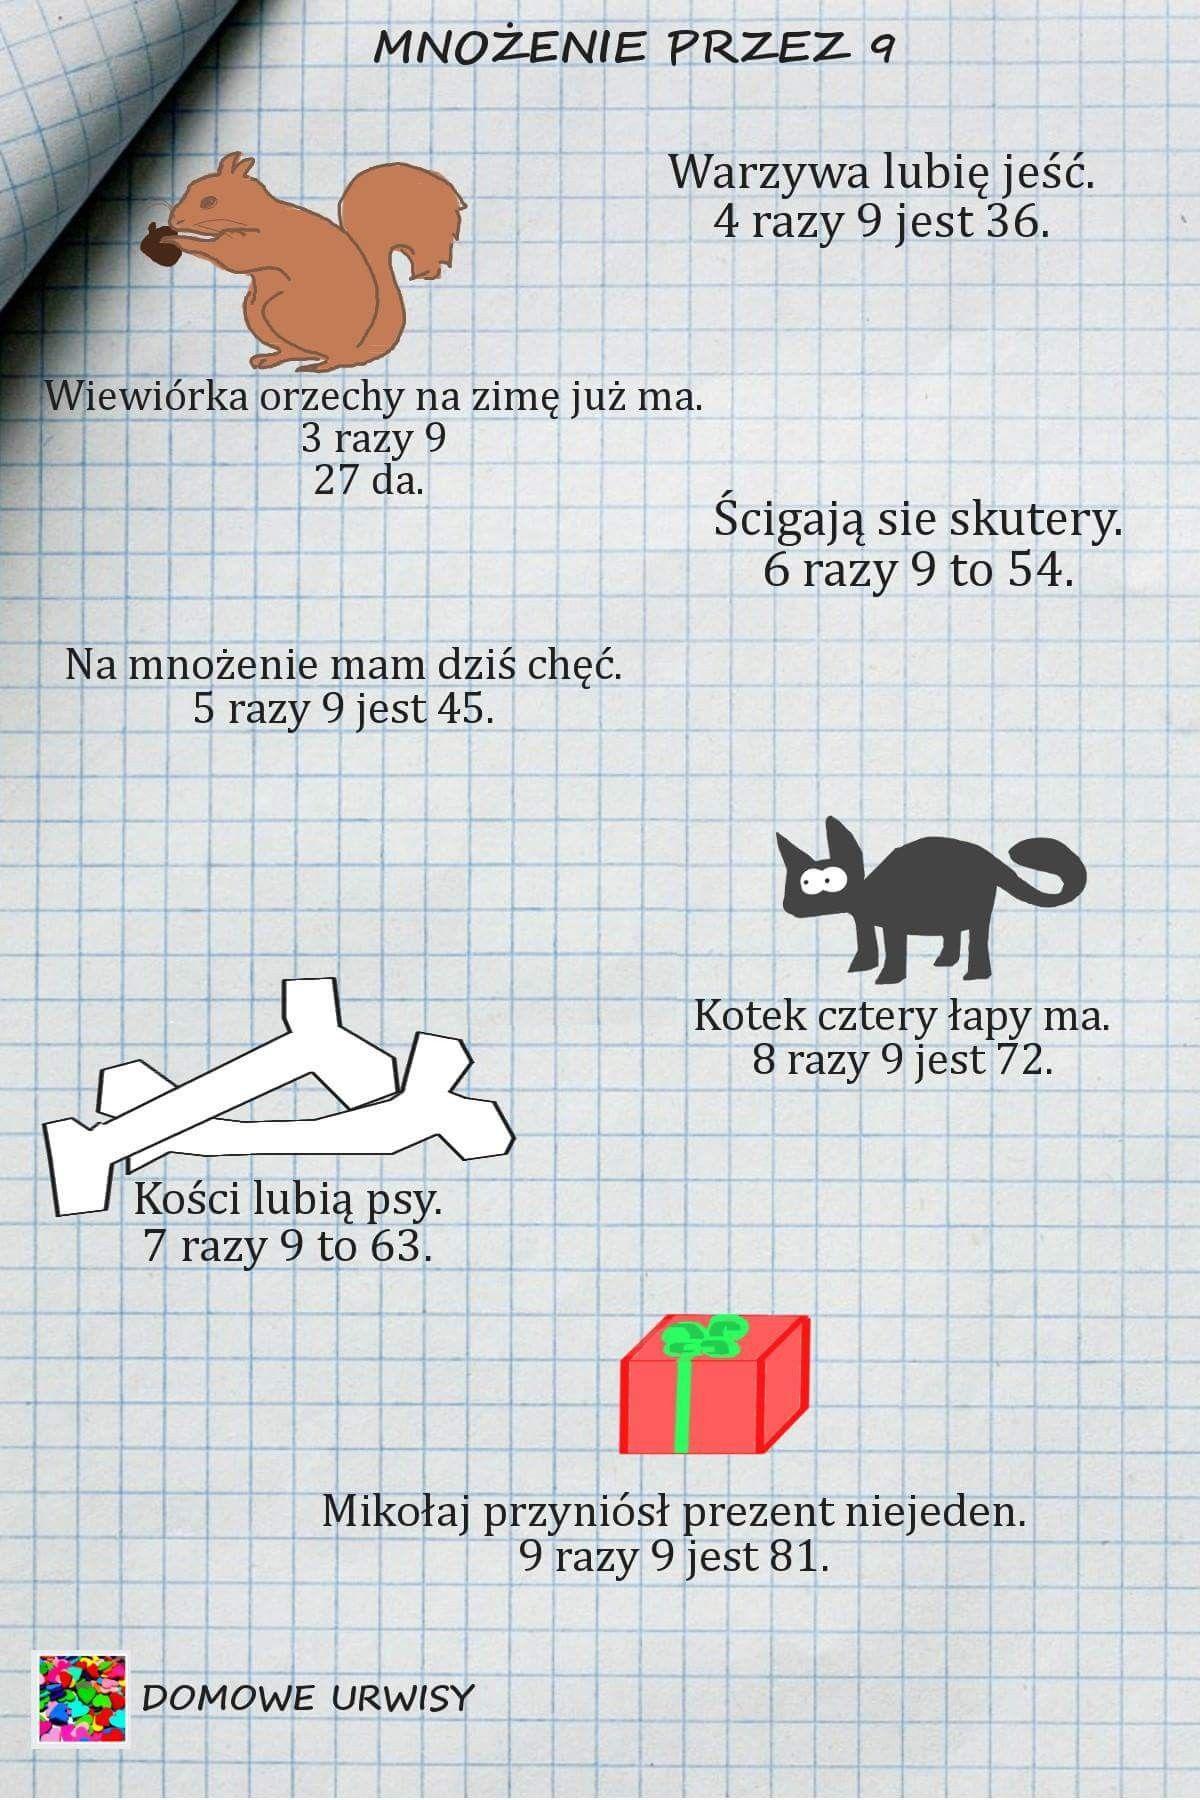 Mnozenie Przez 9 Simple Math Math Problem Solving Polish Language